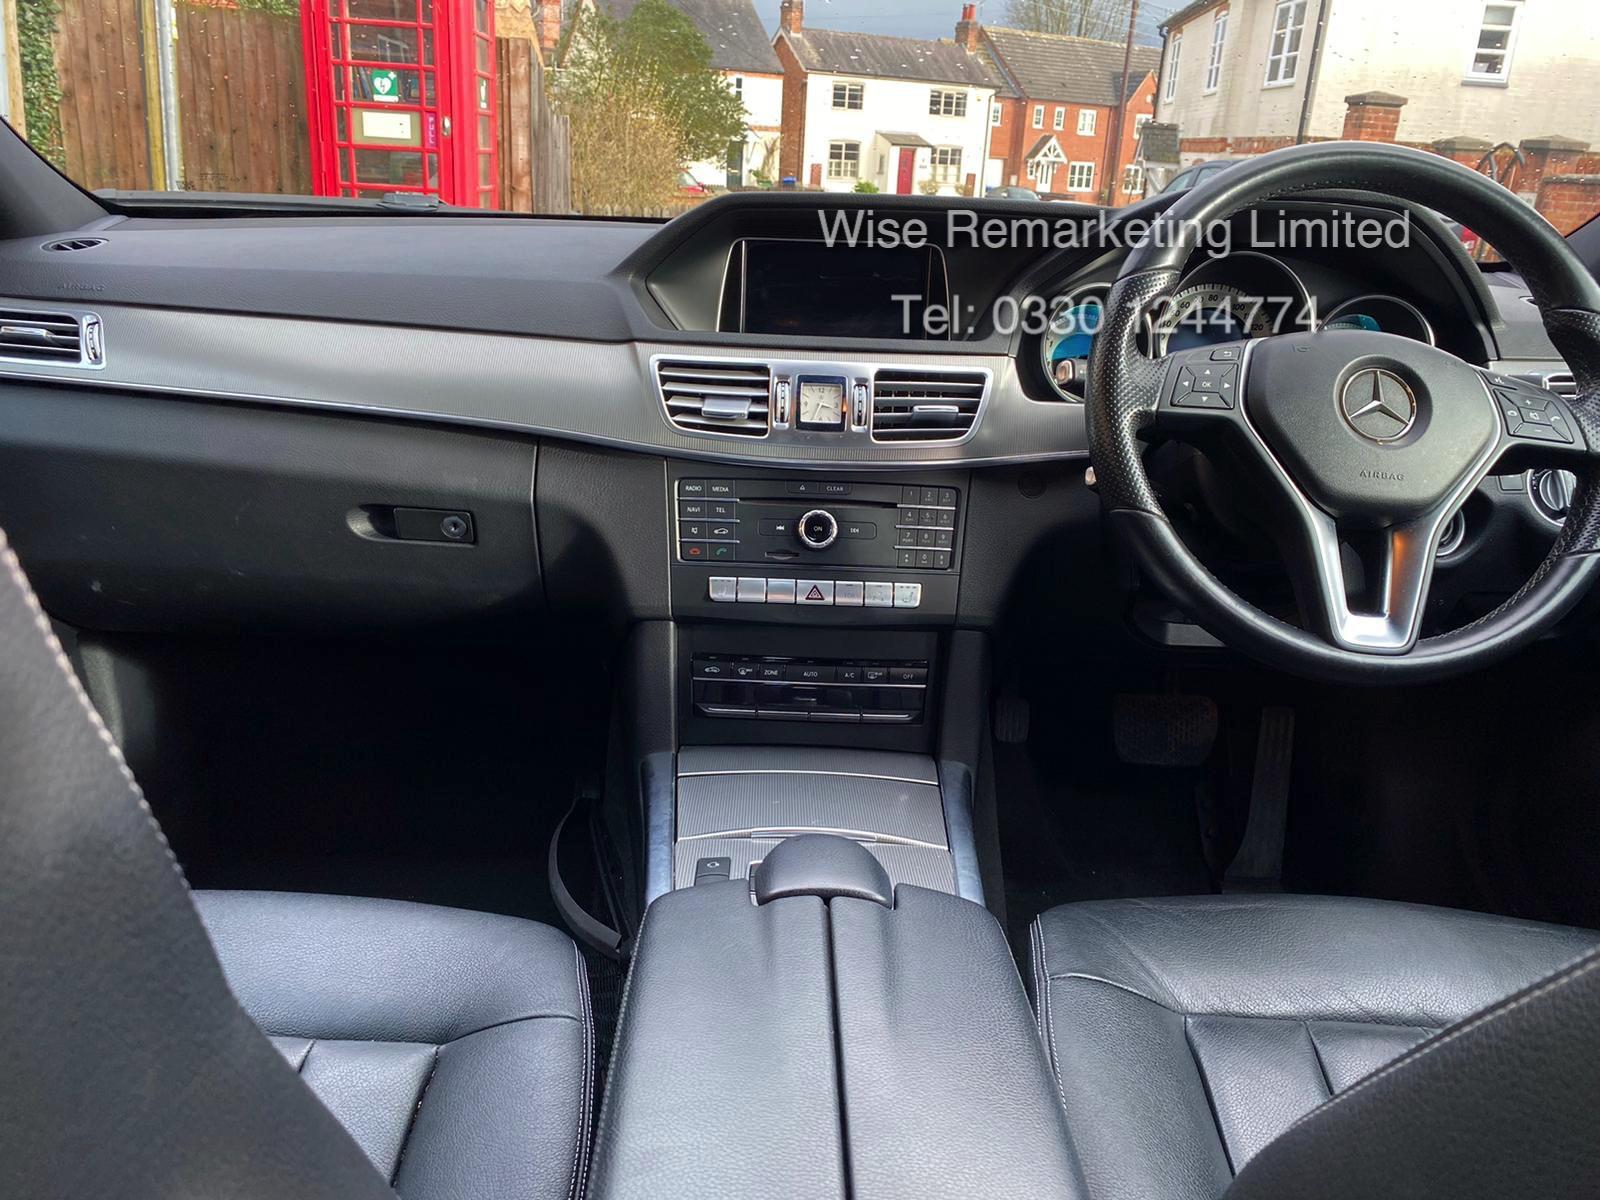 Mercedes E220d 2.1 Special Equipment Auto 2015 15 Reg - 1 Former Keeper - Sat Nav - Parking Sensors - Image 9 of 14